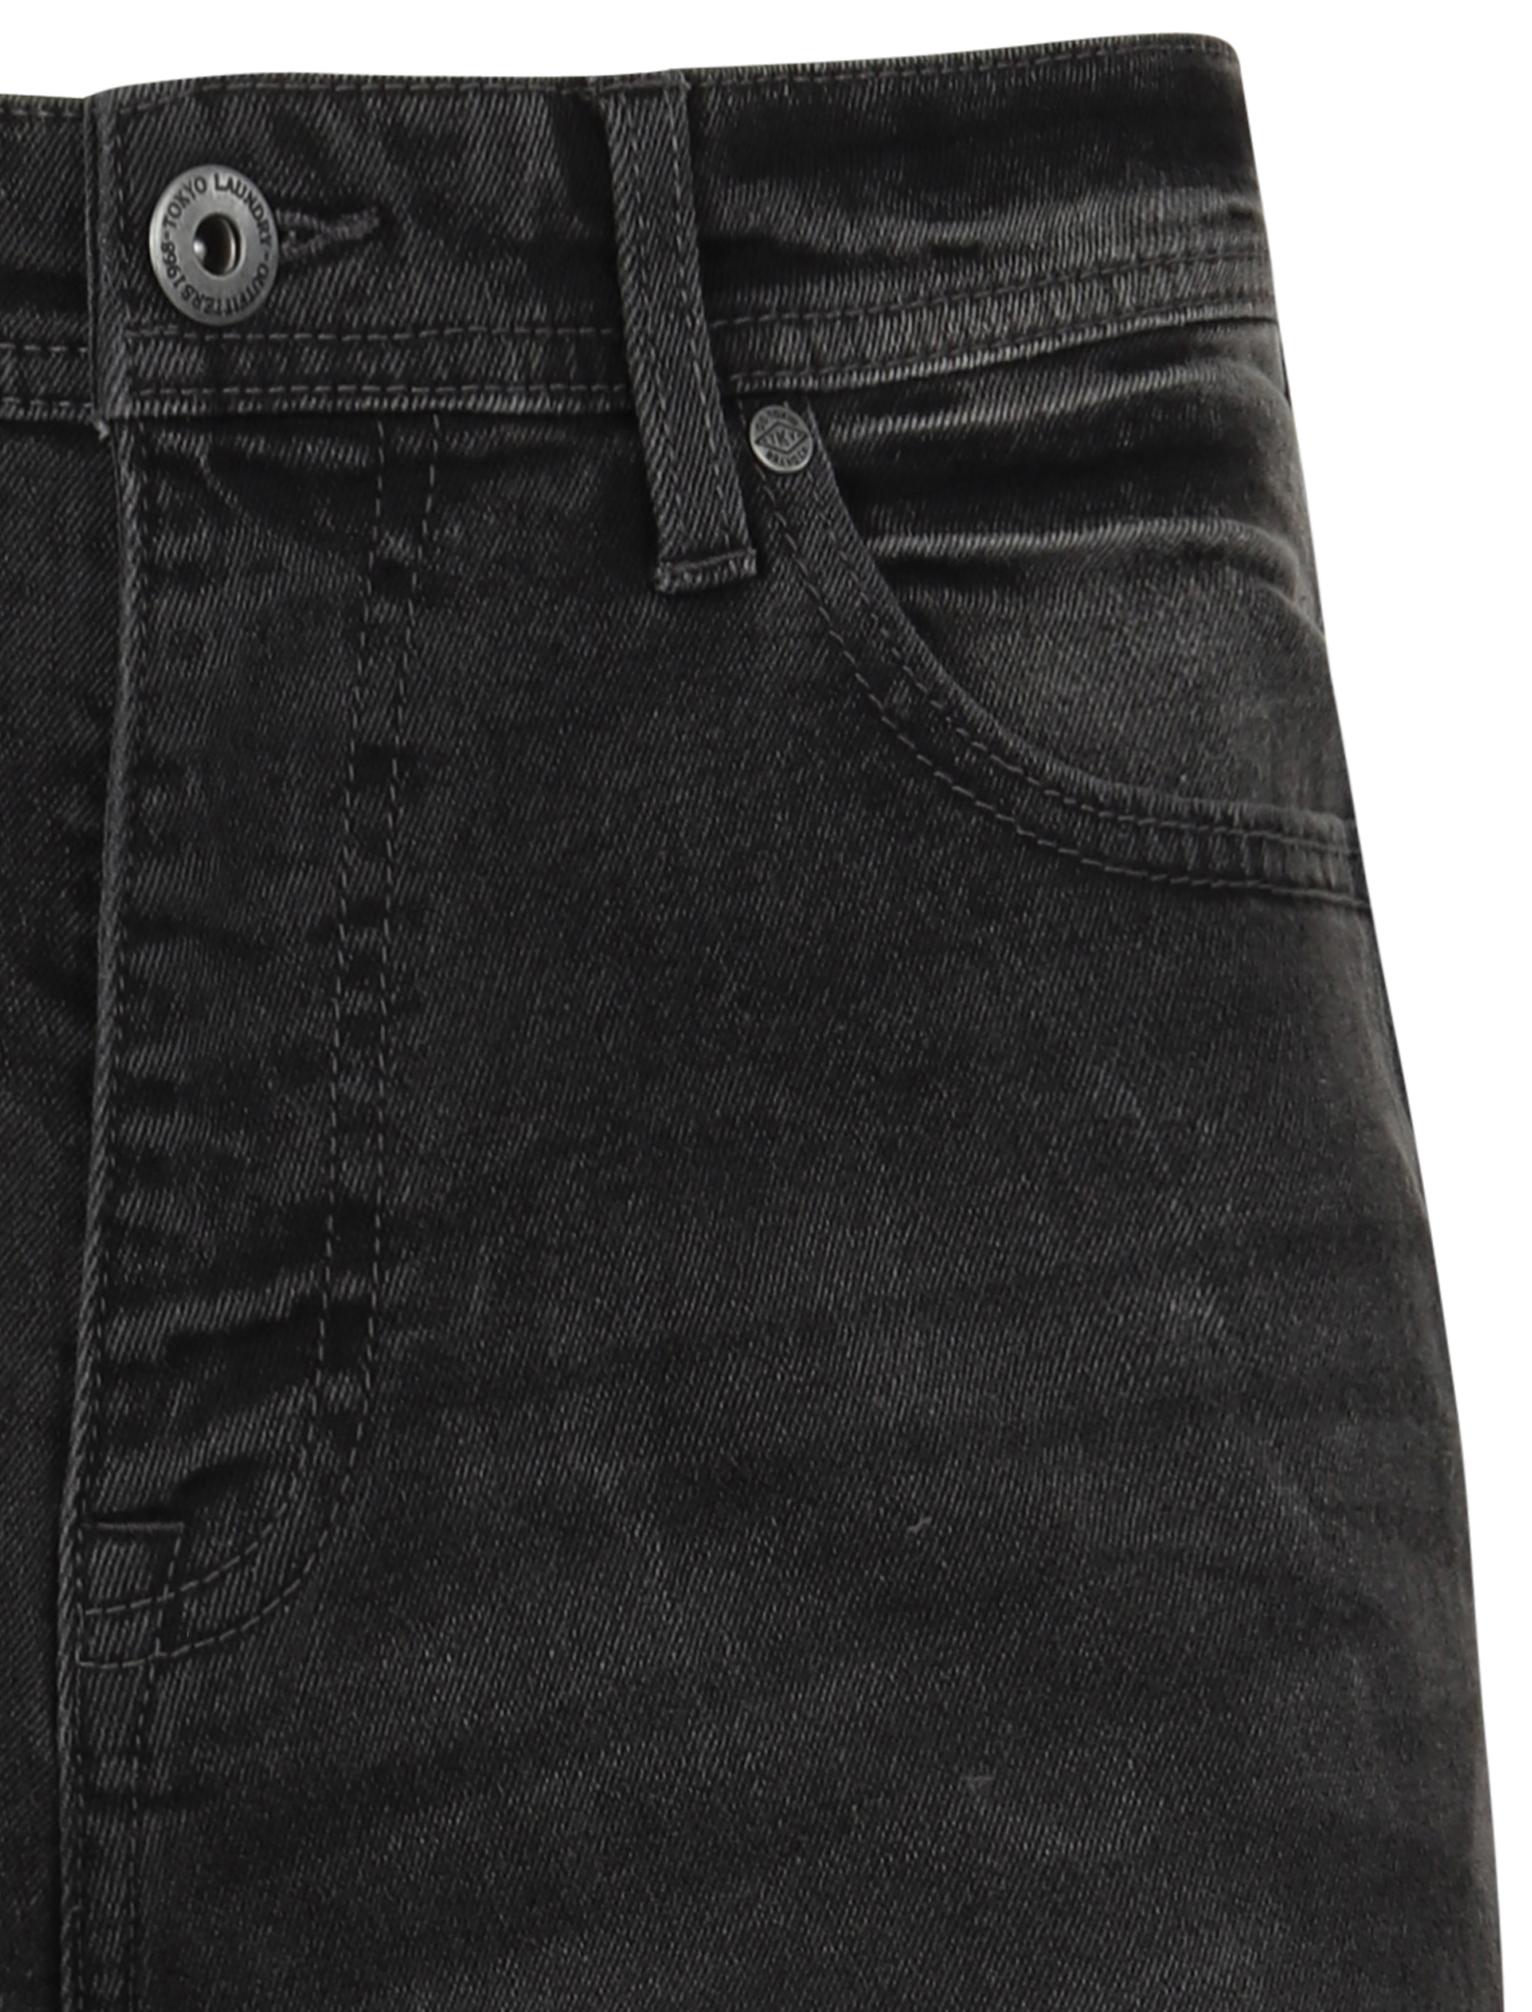 Tokyo-Laundry-Mens-Stretch-Denim-Shorts-Chino-Jean-Vintage-Dark-Light-Wash-Slim thumbnail 8